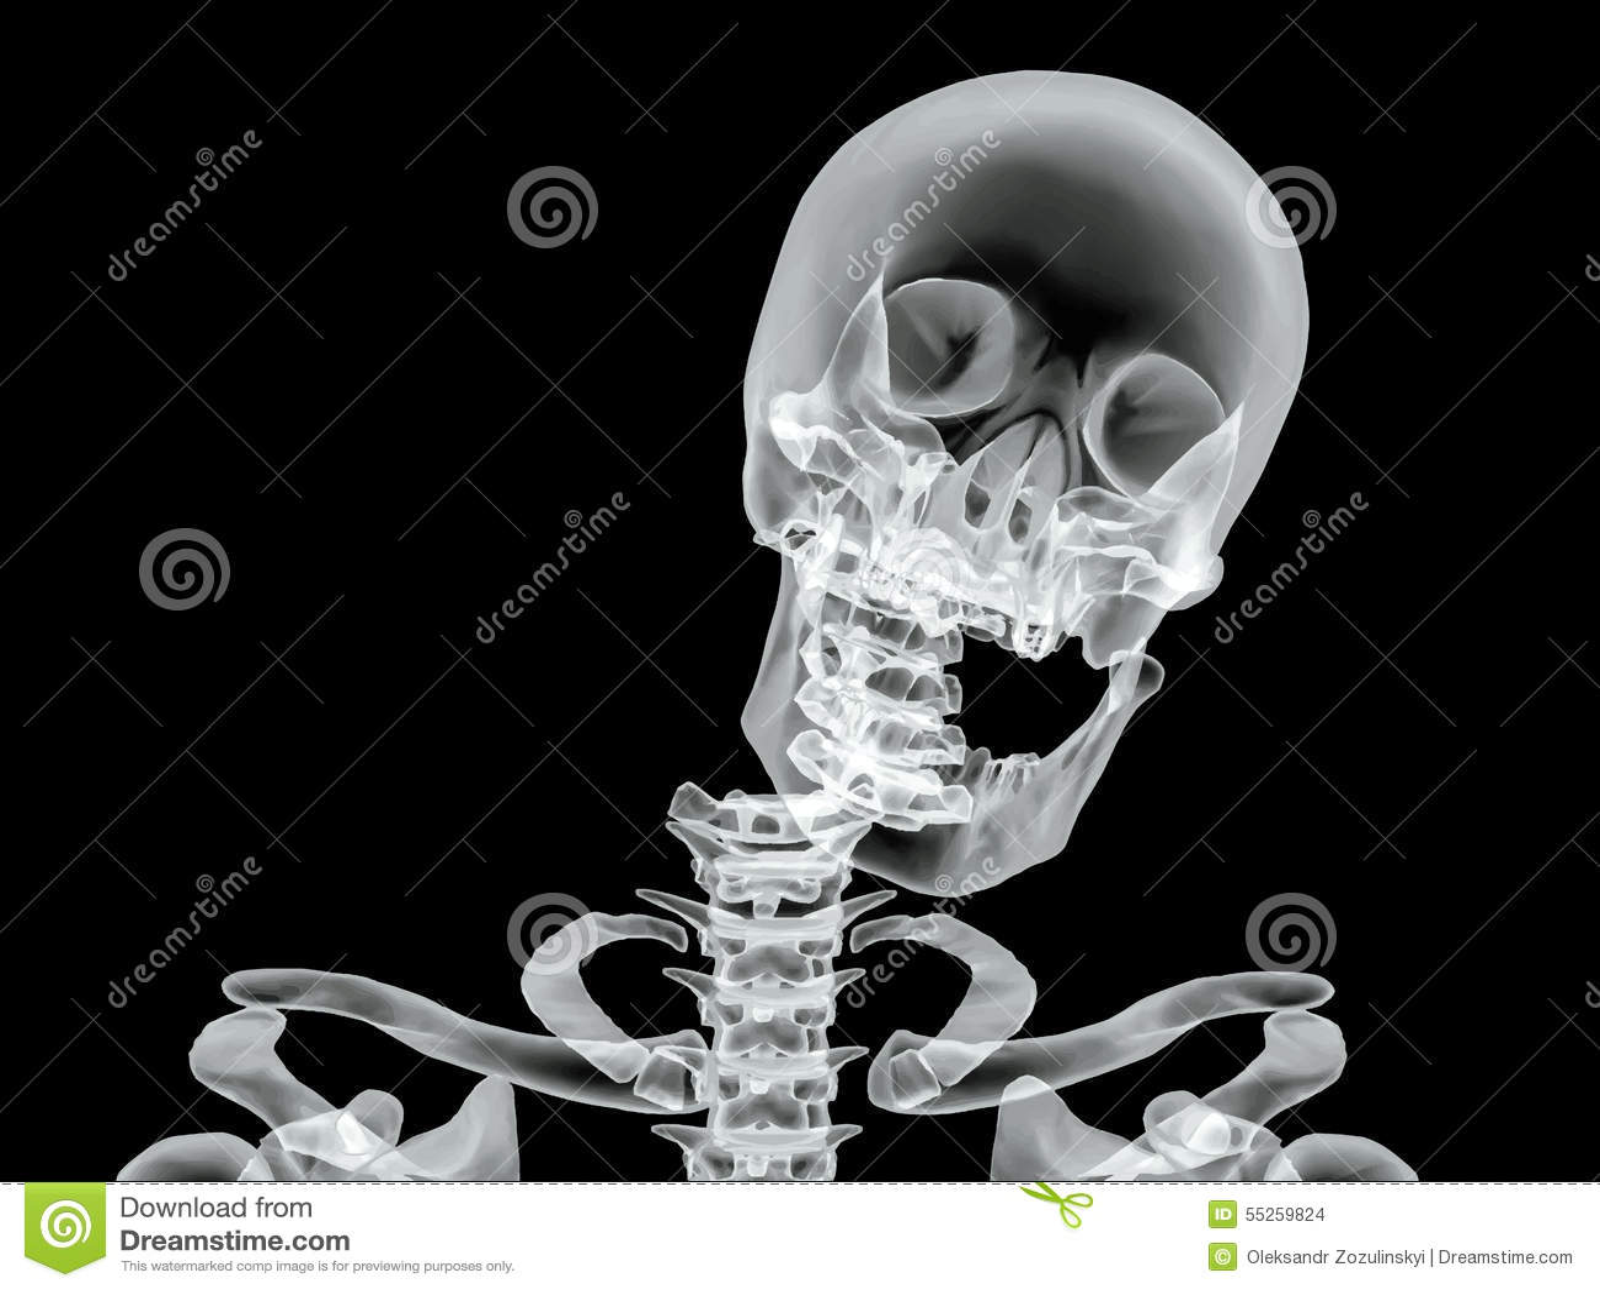 Vector Broken Bone X-ray Image Stock Vector - Image: 55259824